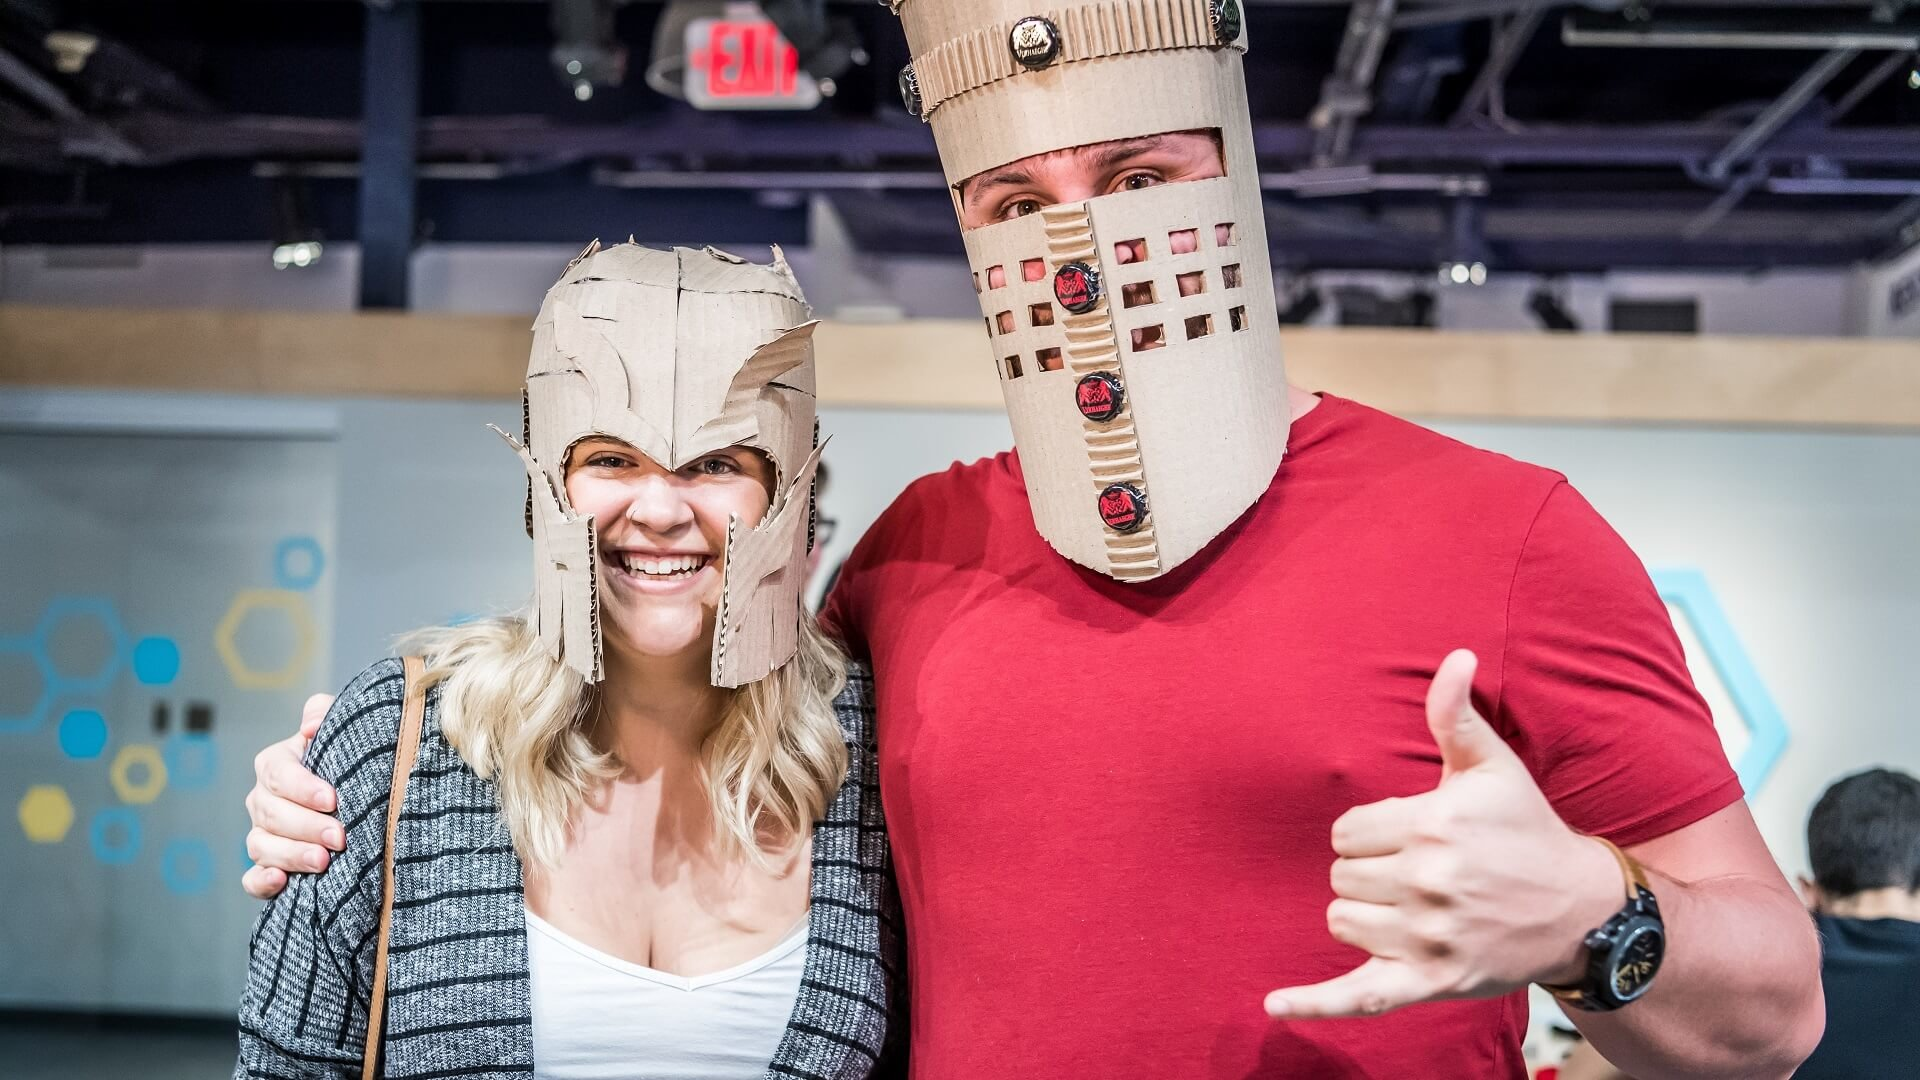 Couple wearing creative cardboard knight helmets at OSC